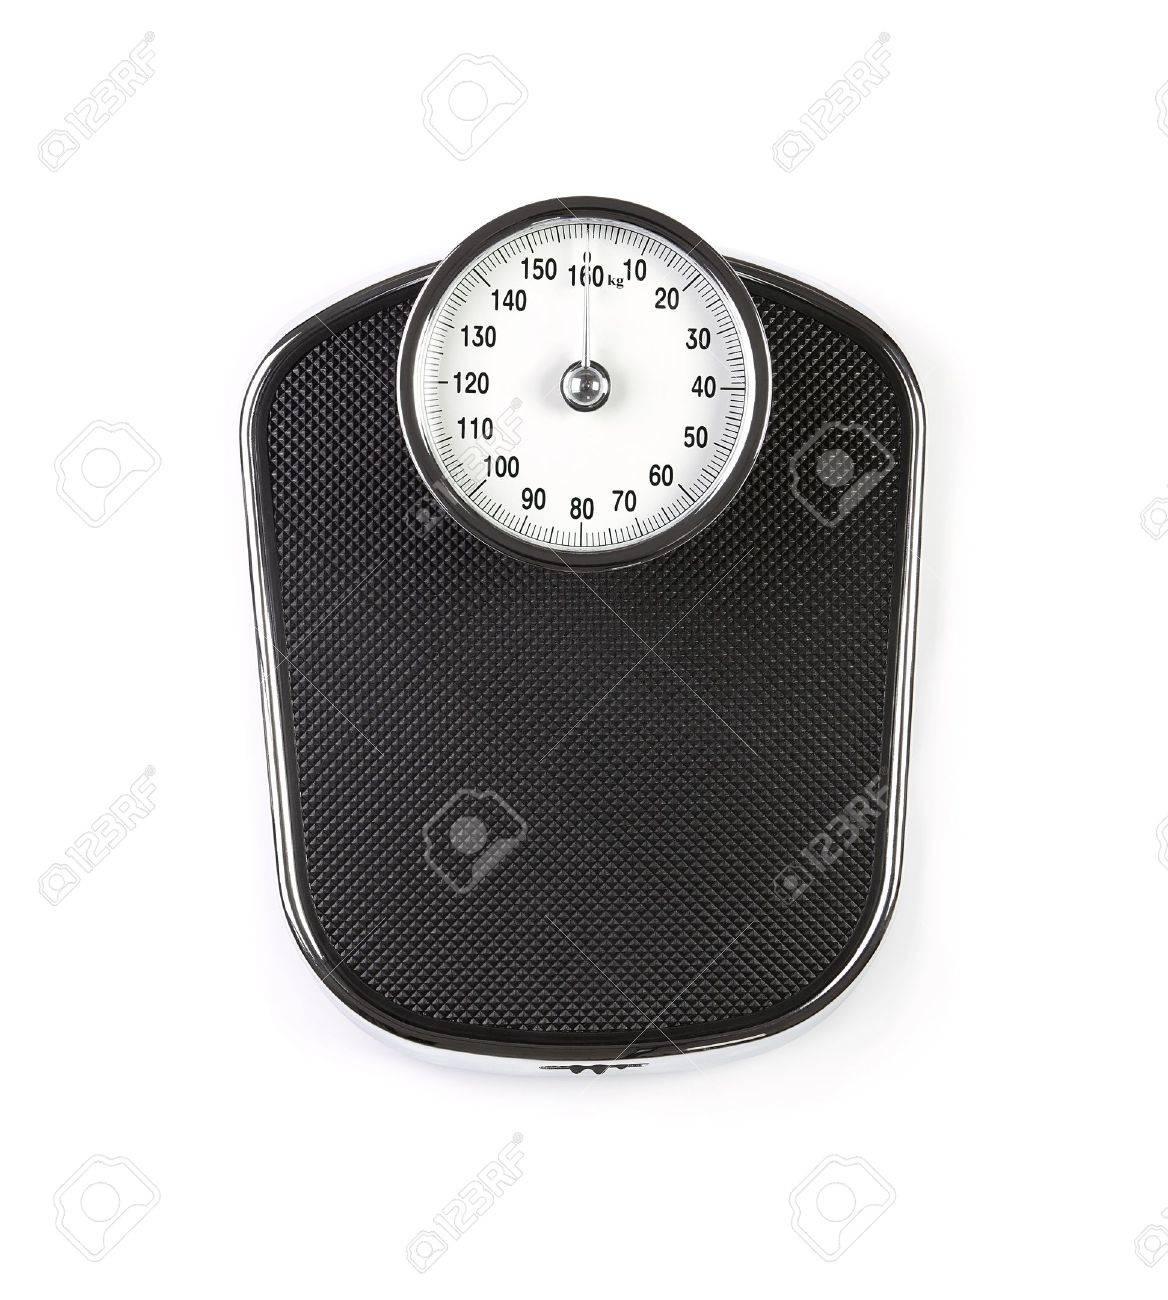 Retro weight scale isolated on white background Stock Photo - 14484932